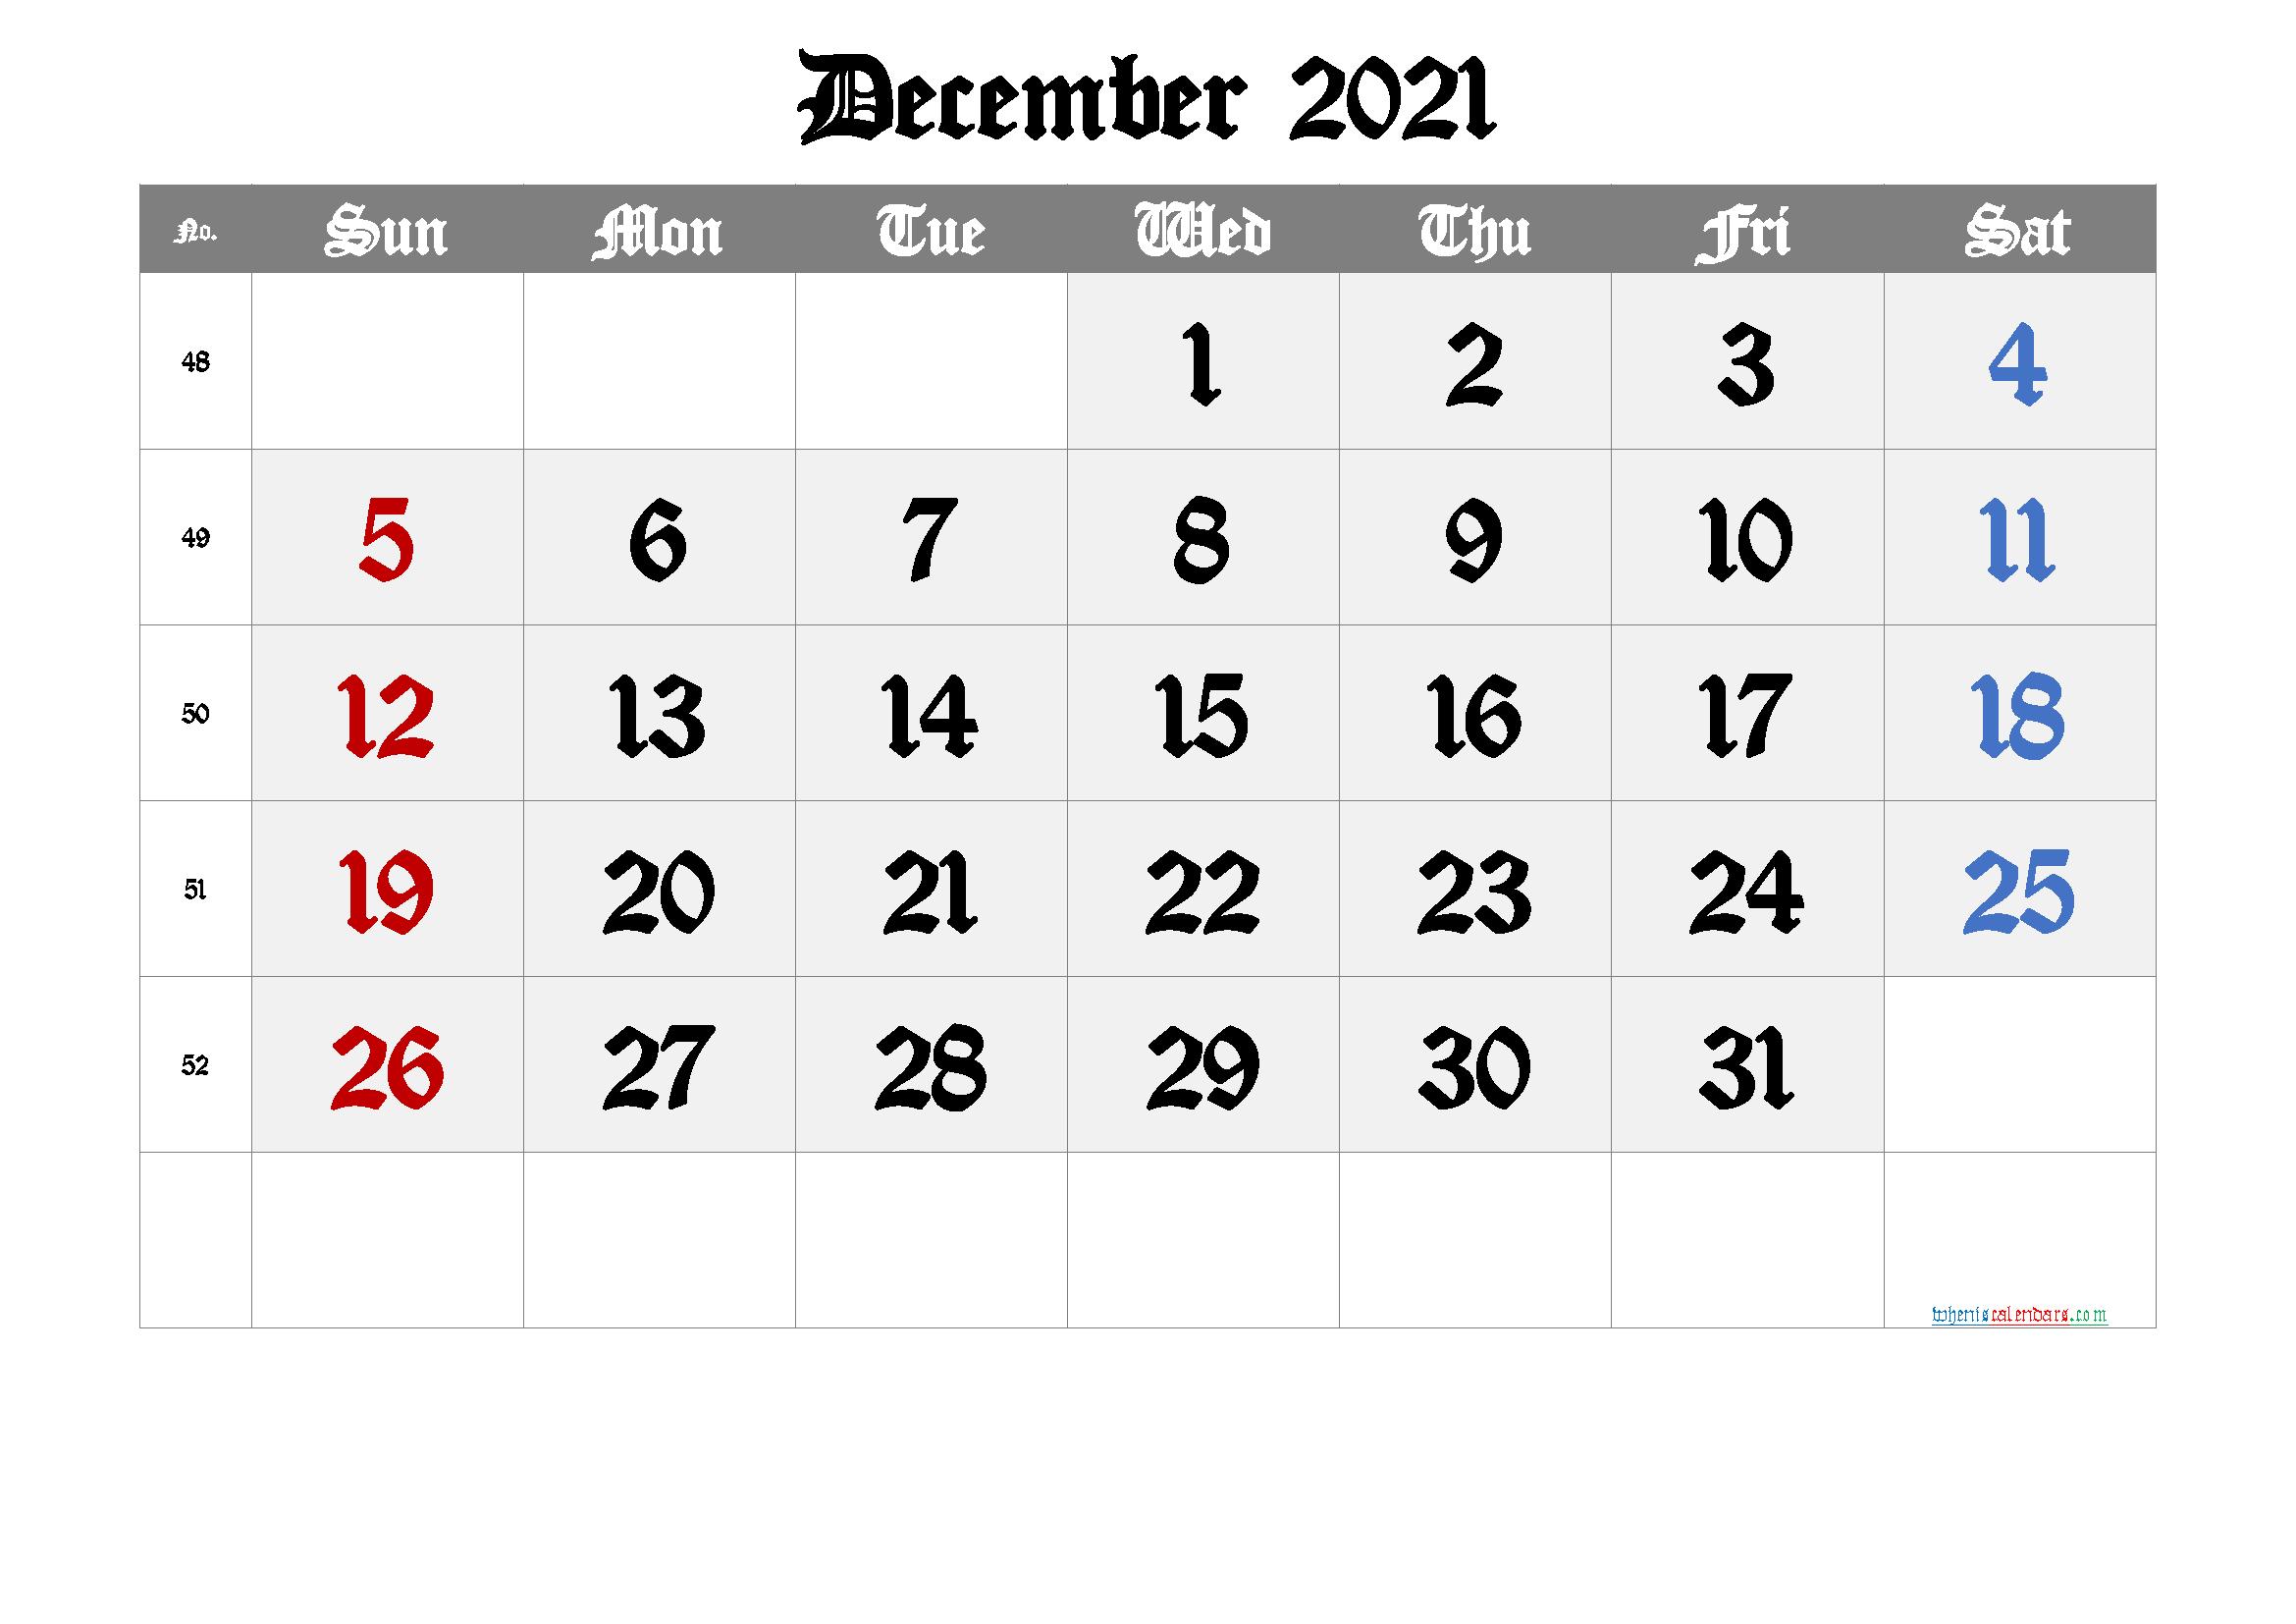 Free Printable December 2021 Calendar - 2022 Calendar